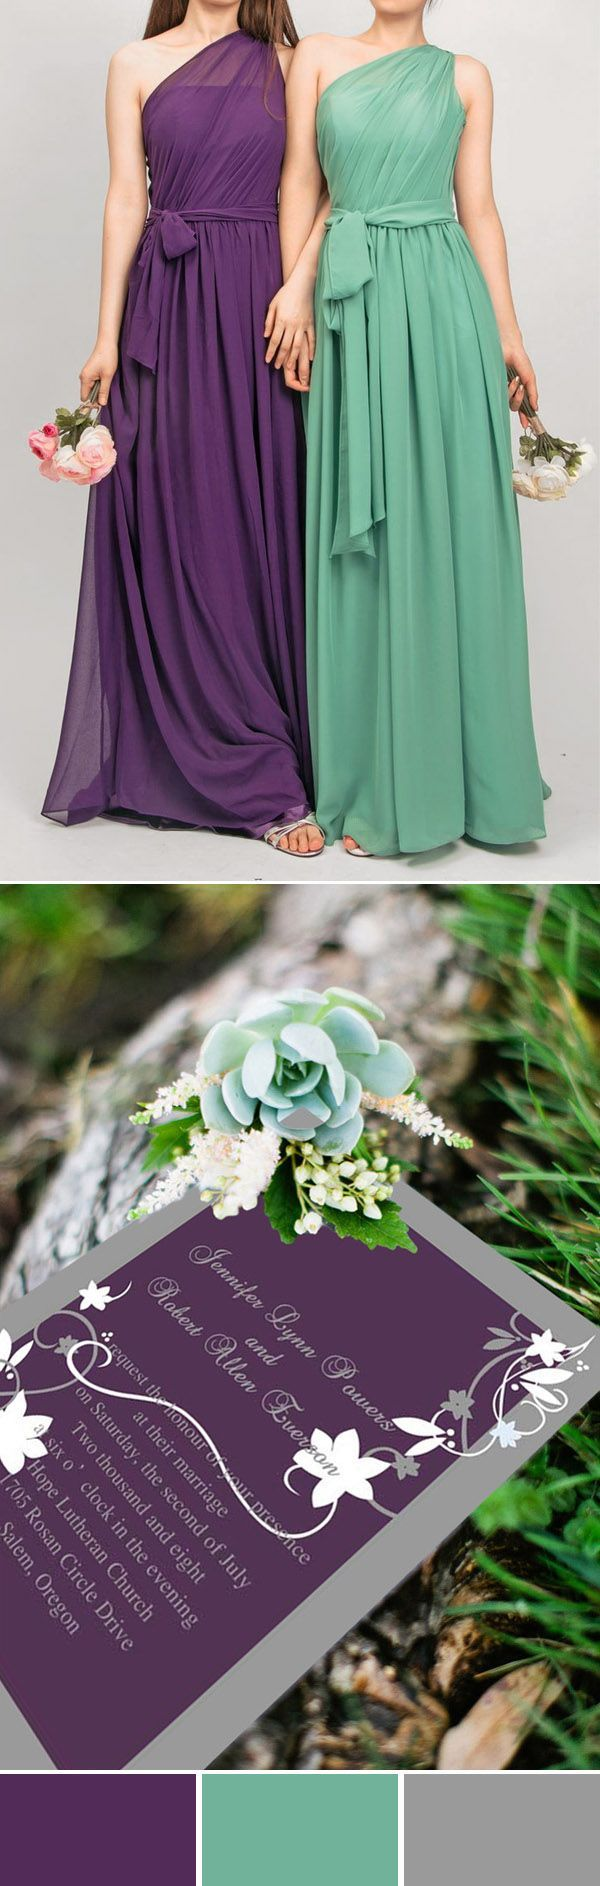 Purple Wedding Color Ideas: Beautiful Bridesmaid Dresses and ...